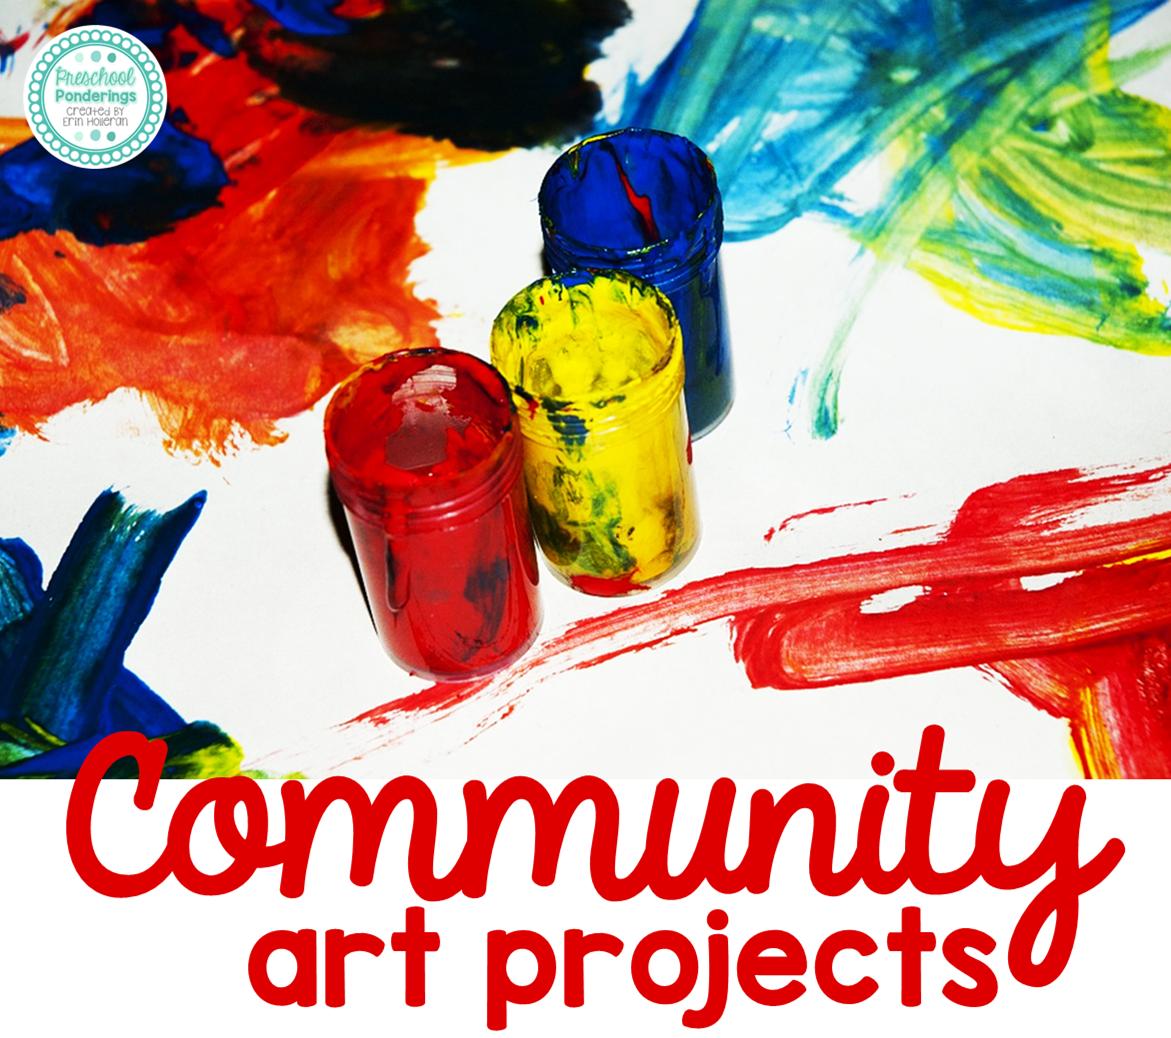 My Community Art Projects